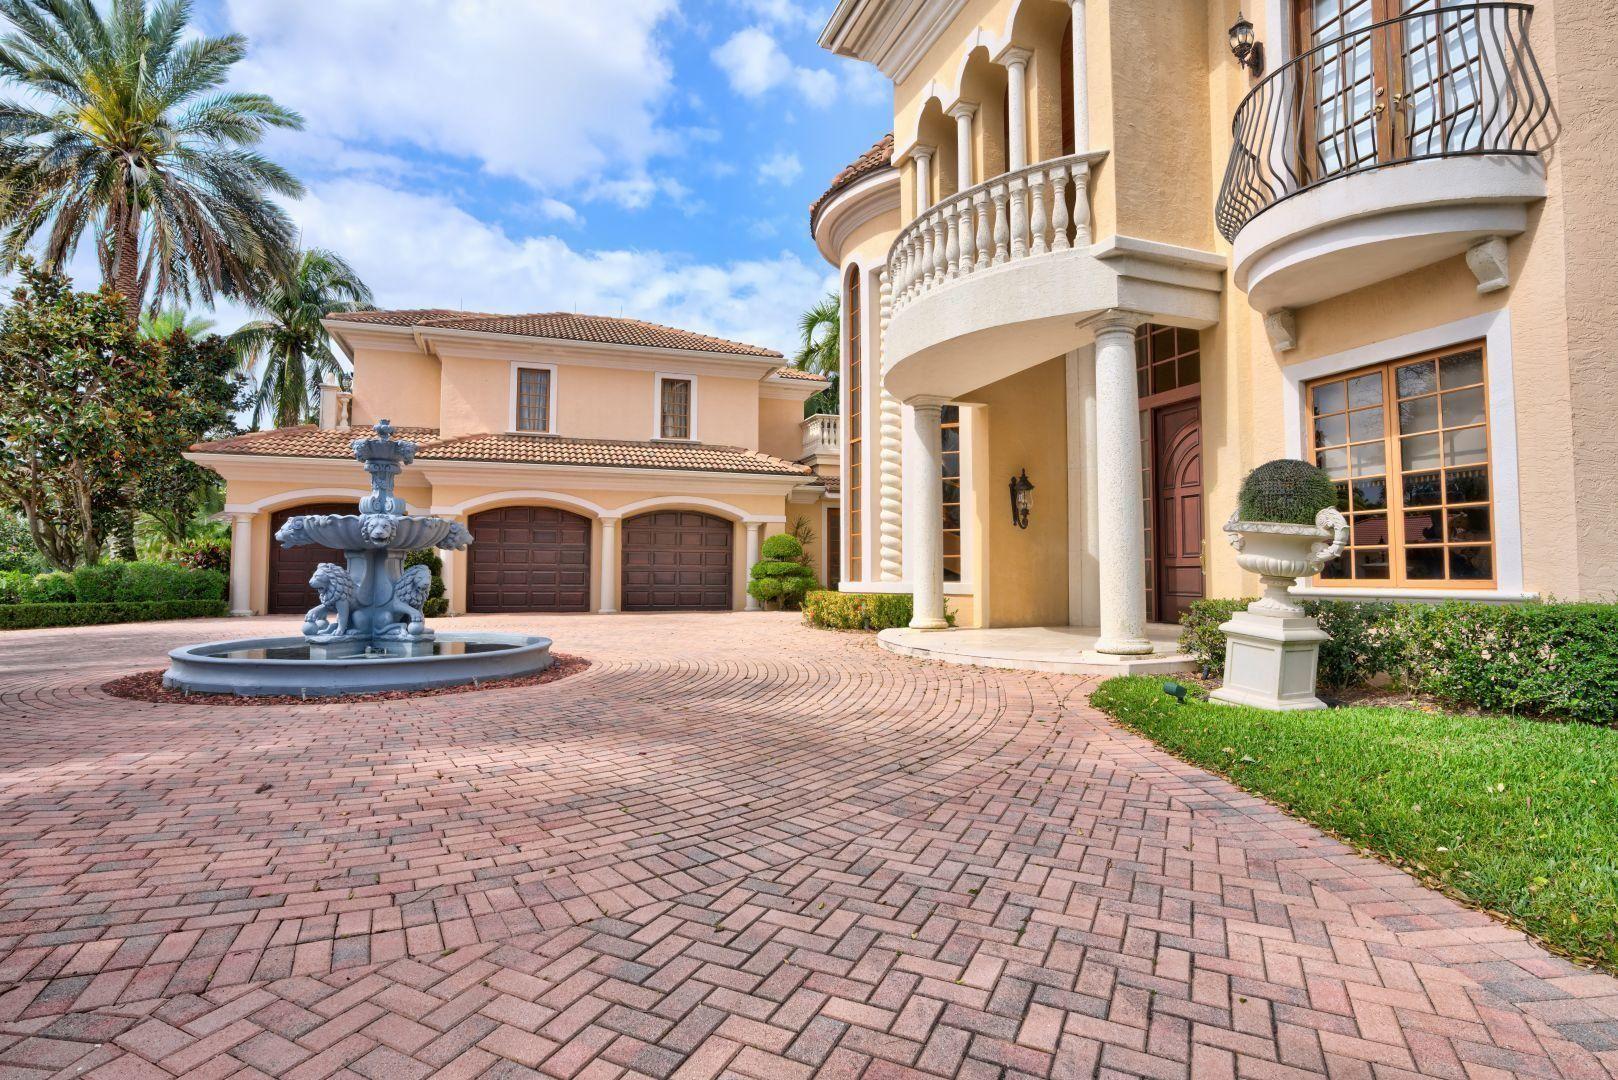 Photo of 12 St George Place, Palm Beach Gardens, FL 33418 (MLS # RX-10610992)